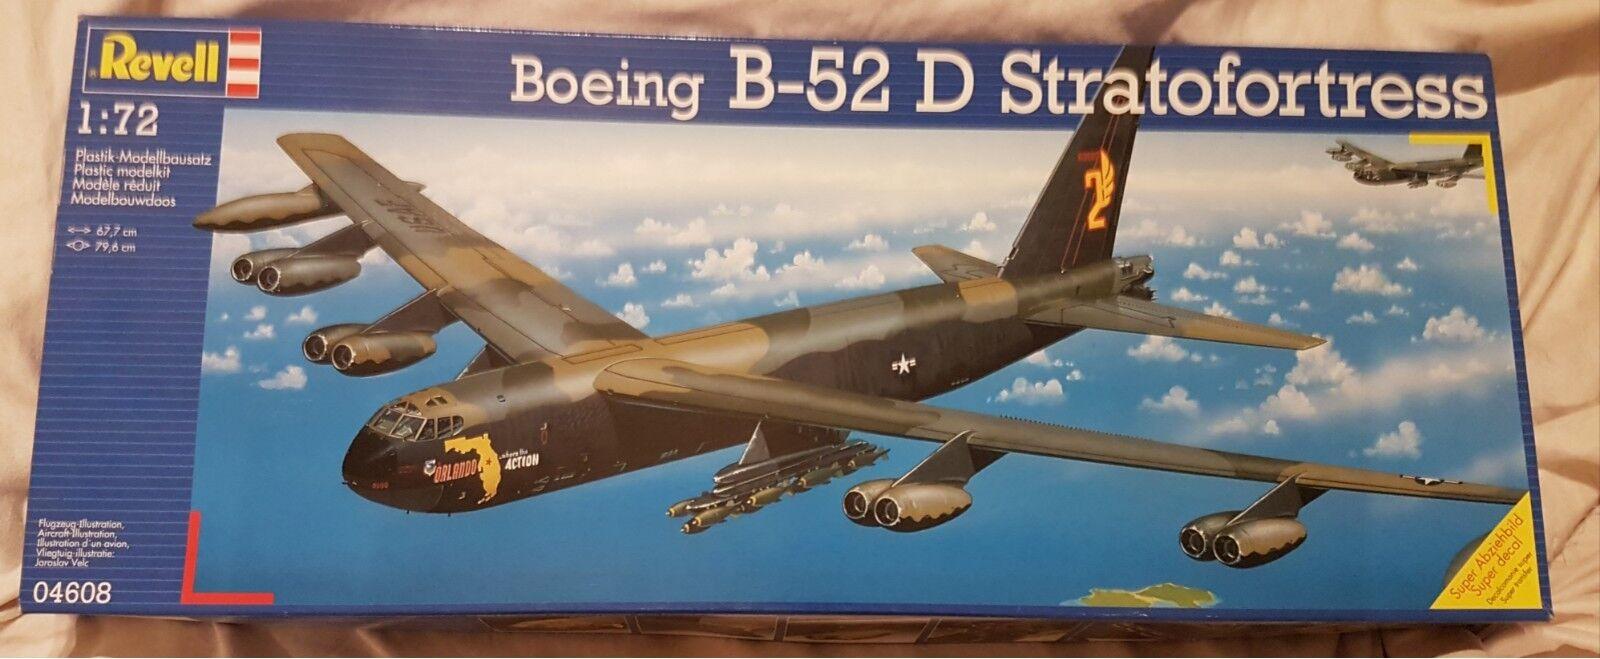 Revell Boeing b-52 D  US Stratofortress Bombardier 04608 Top Kit Kit 1 72  livraison gratuite